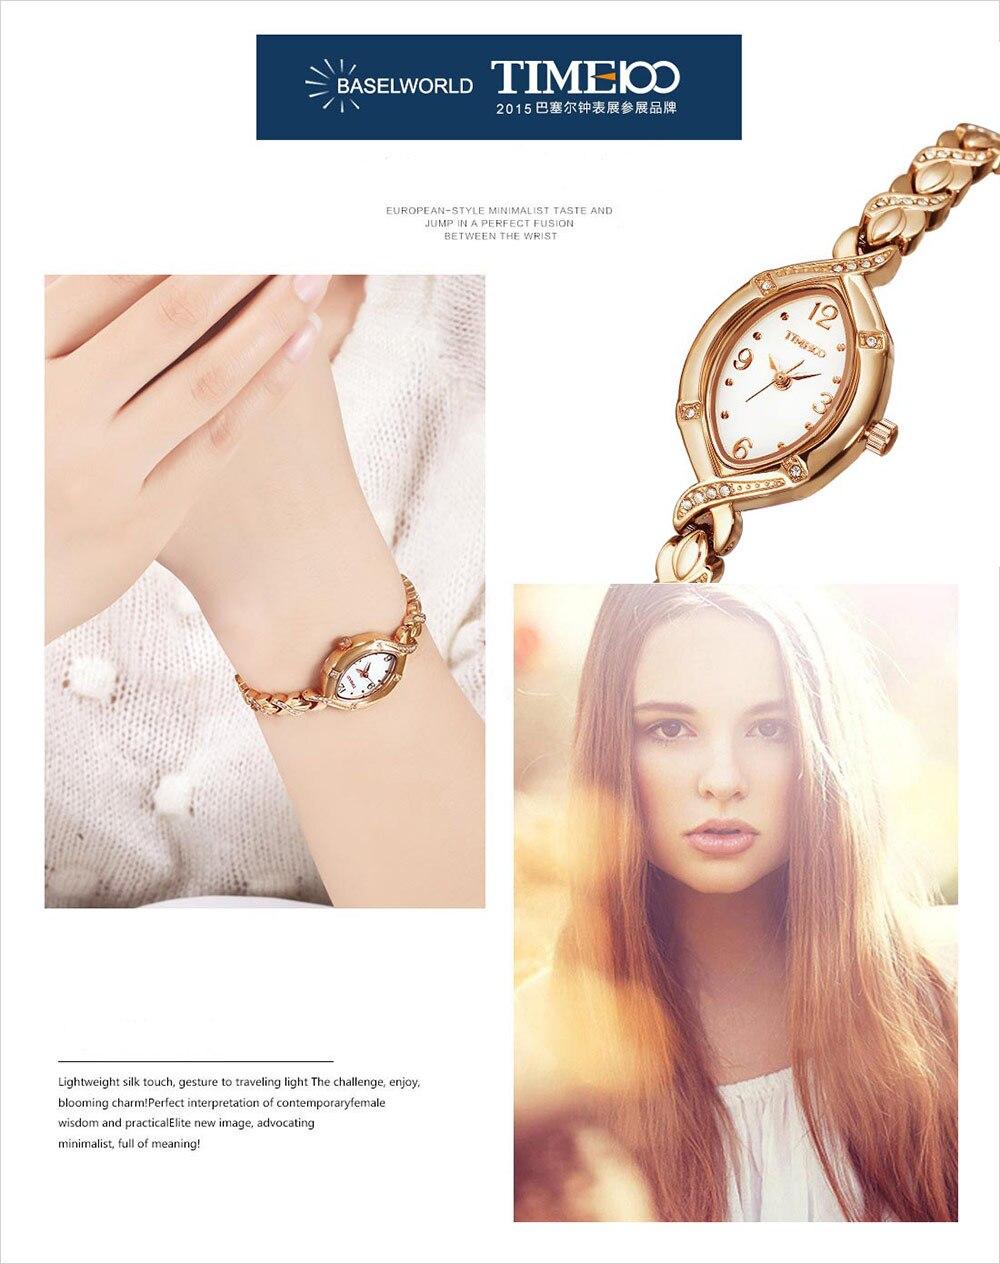 TIME100 Kvinnor Klockor Kvarts Jewlry Guld Cristal Dial Rhinestone - Damklockor - Foto 3